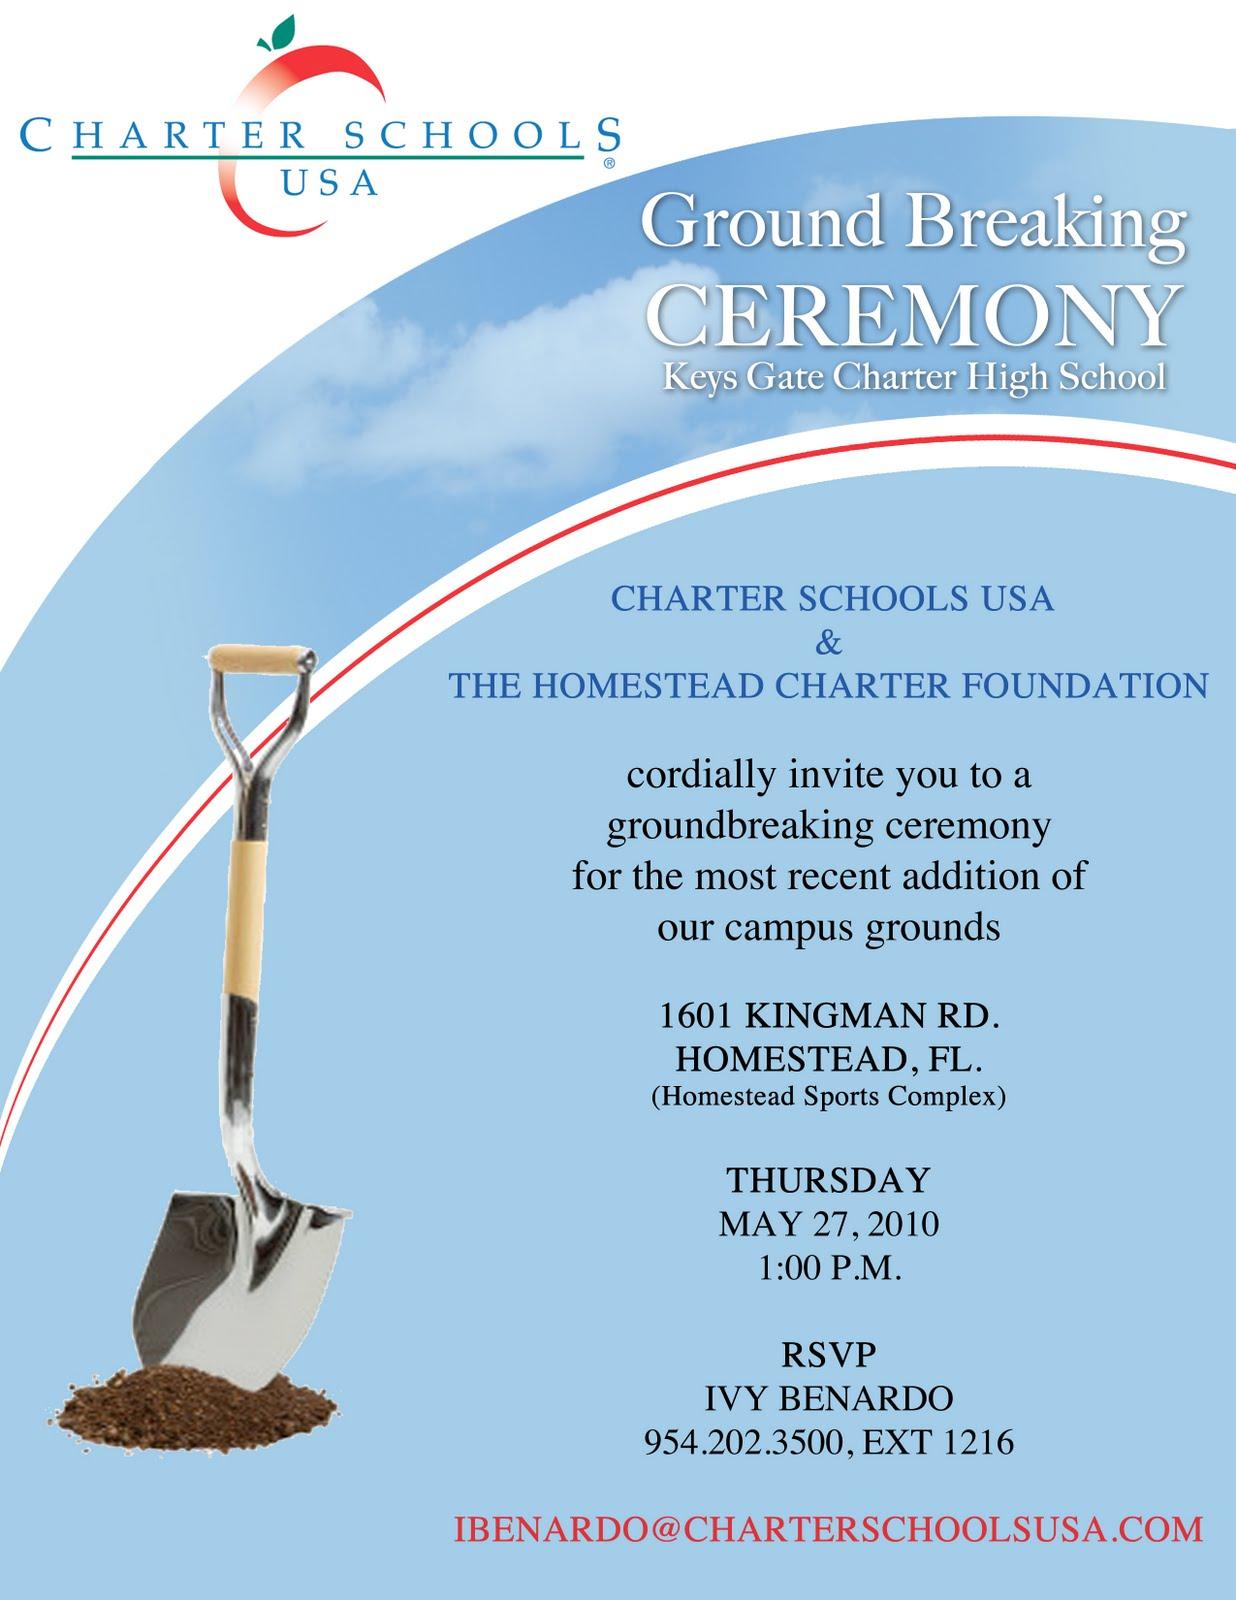 Groundbreaking ceremony invitation templates groundbreaking invitation related keywords ground ceremony maxwellsz